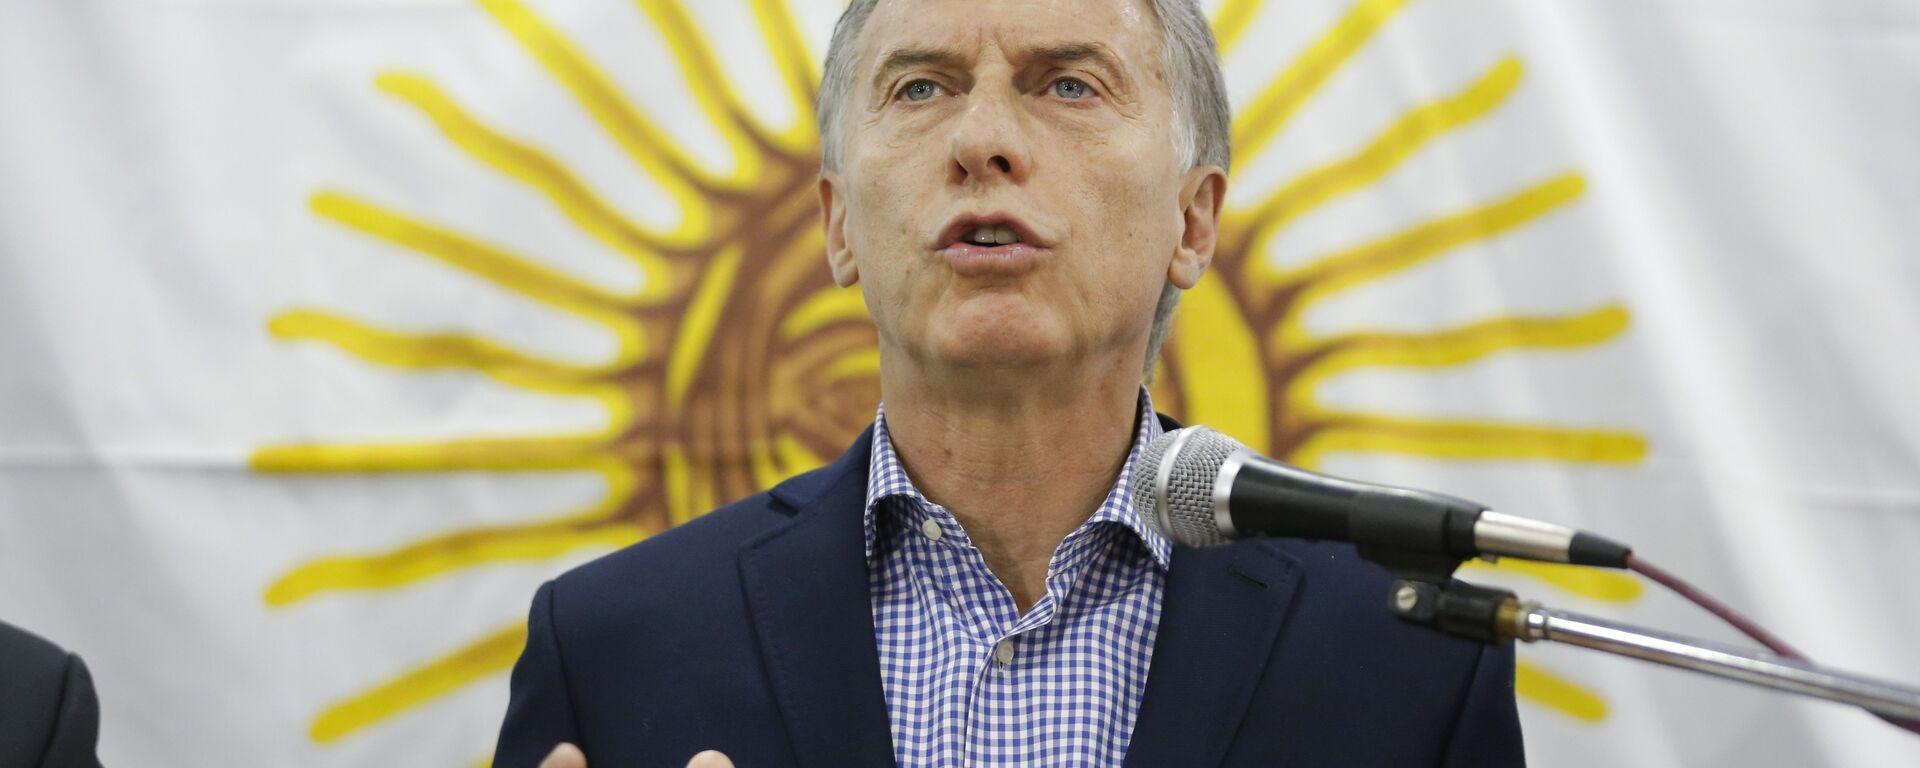 Mauricio Macri, presidente de Argentina - Sputnik Mundo, 1920, 13.07.2021